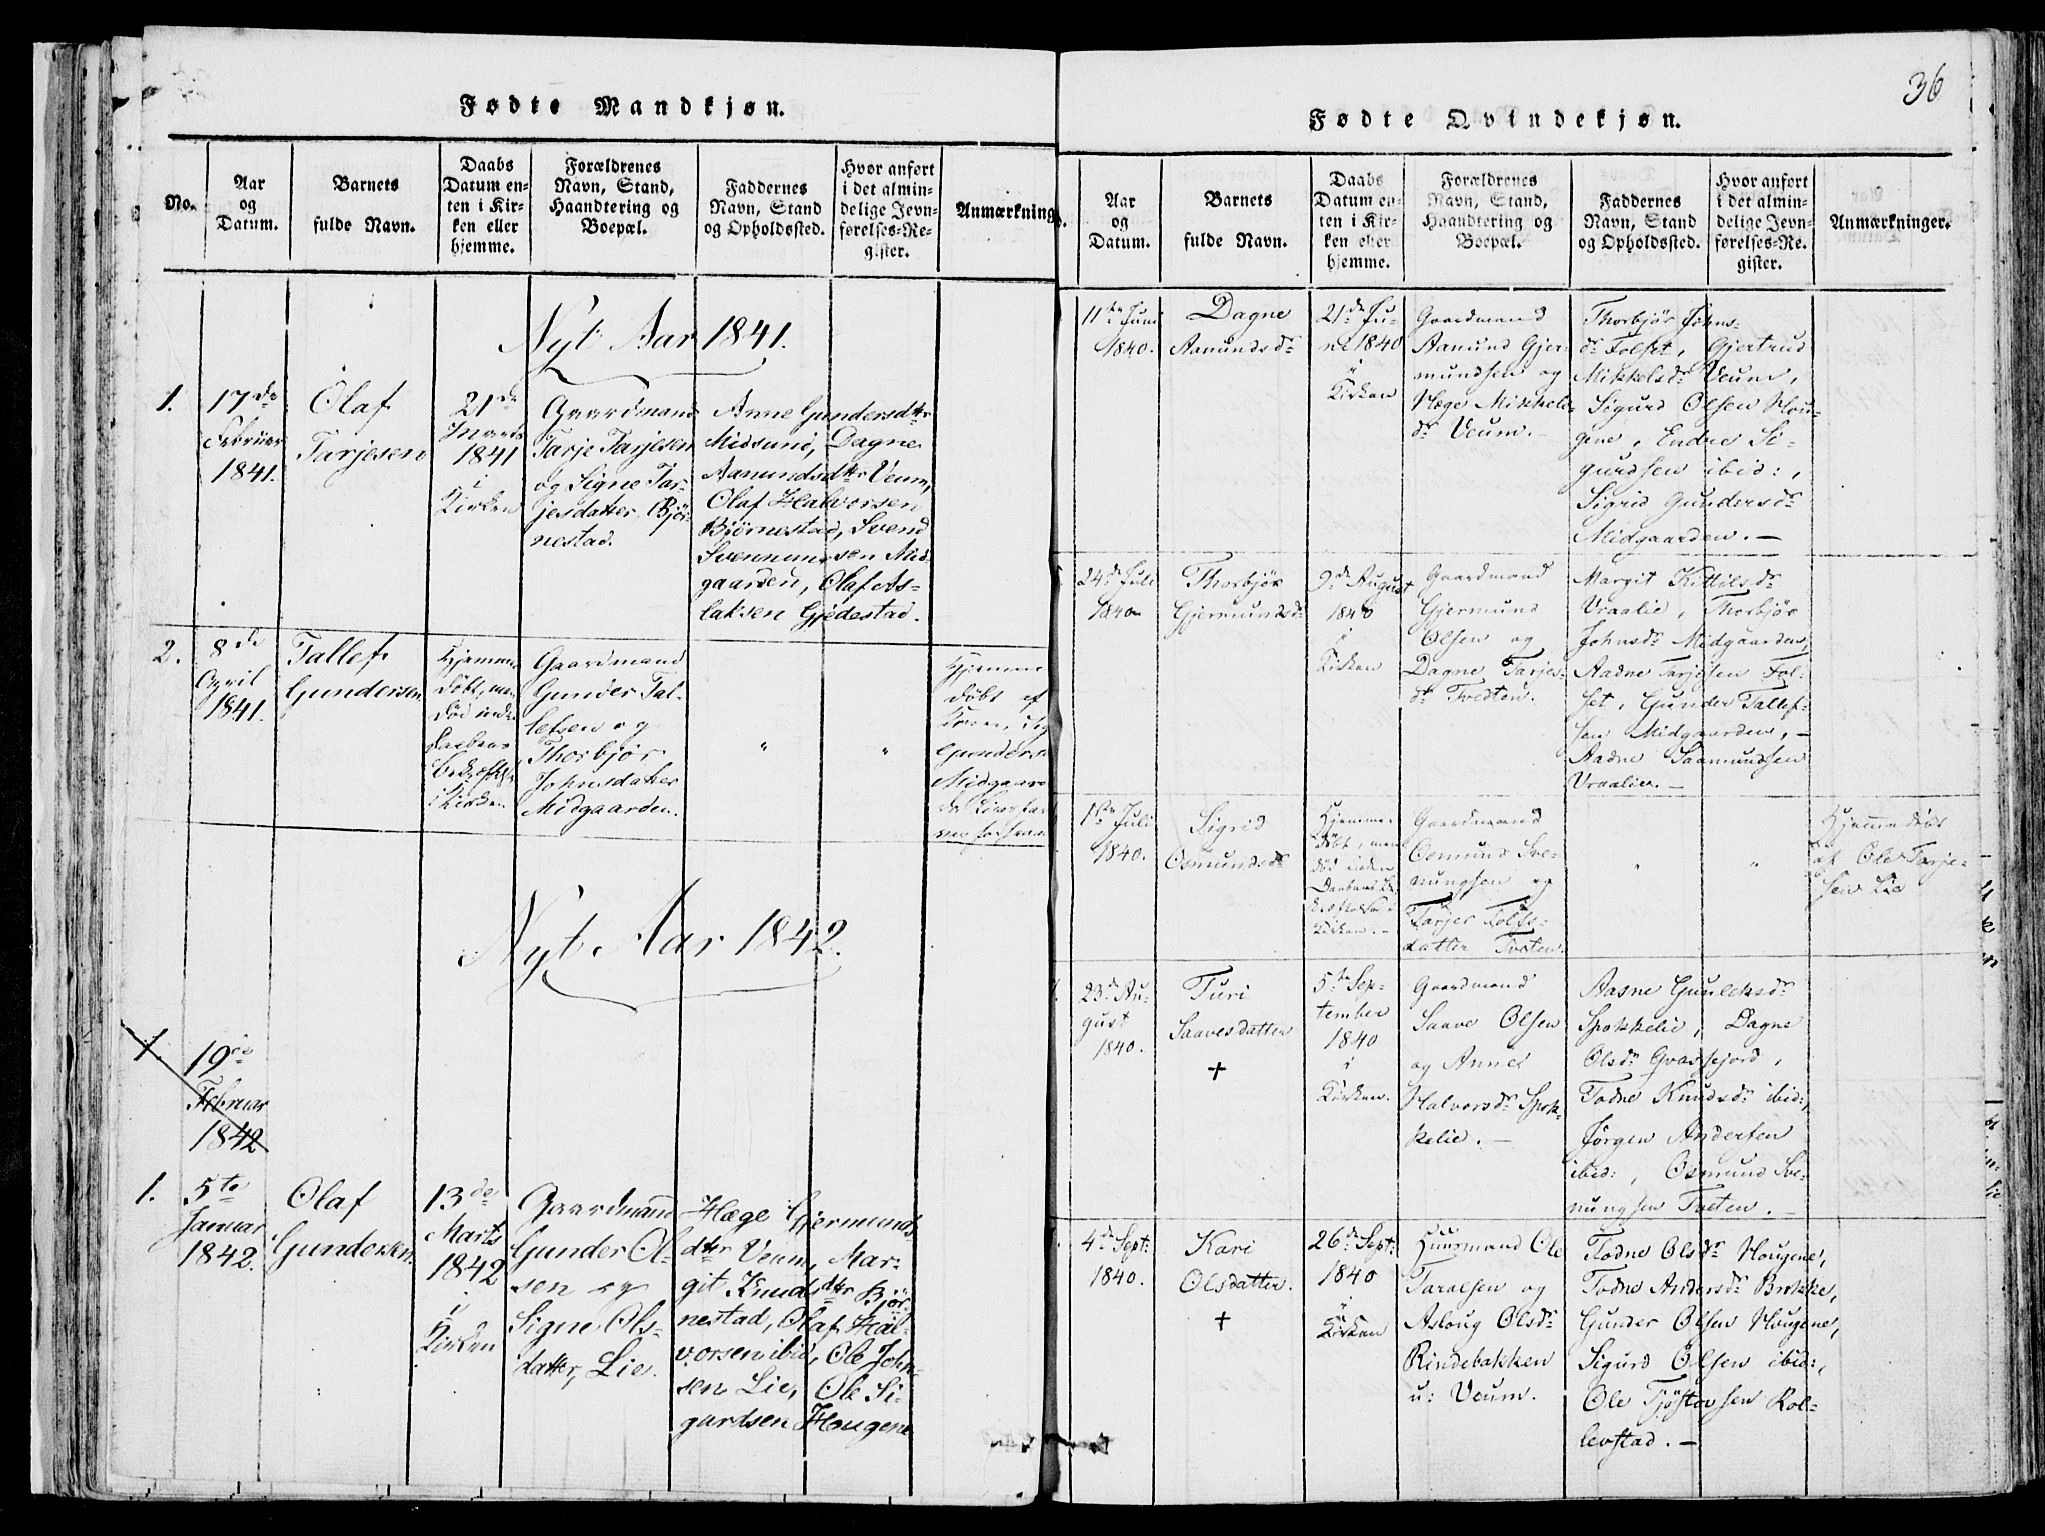 SAKO, Fyresdal kirkebøker, F/Fb/L0001: Ministerialbok nr. II 1, 1815-1854, s. 36